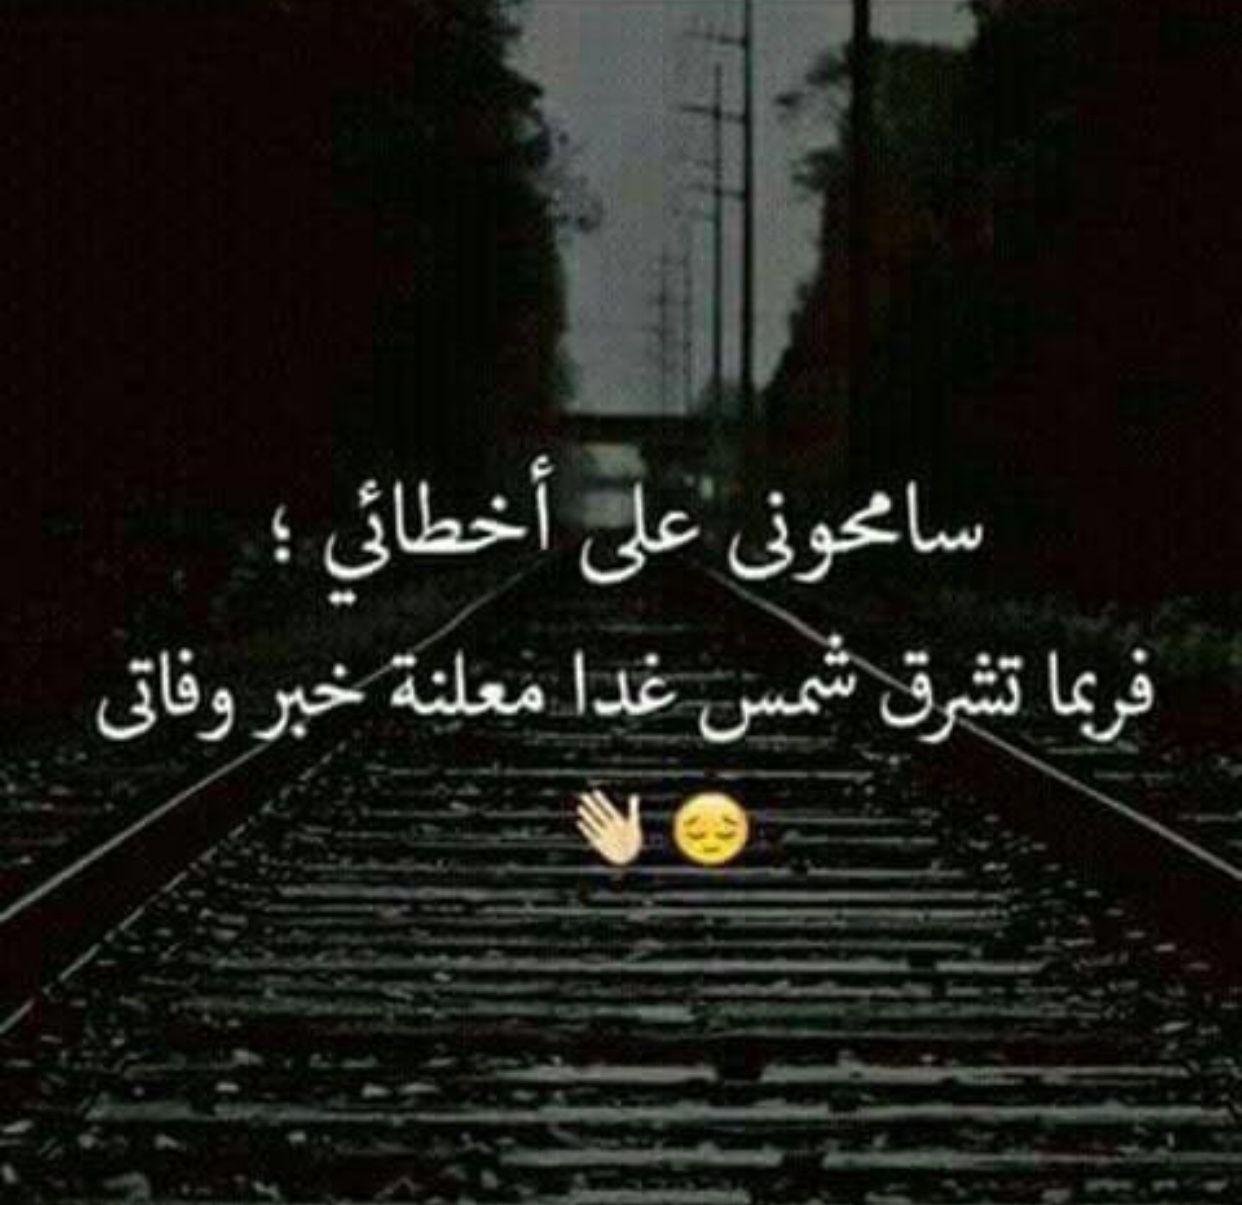 Pin By Princess On اليكى Arabic Quotes Arabic Jokes Love In Arabic